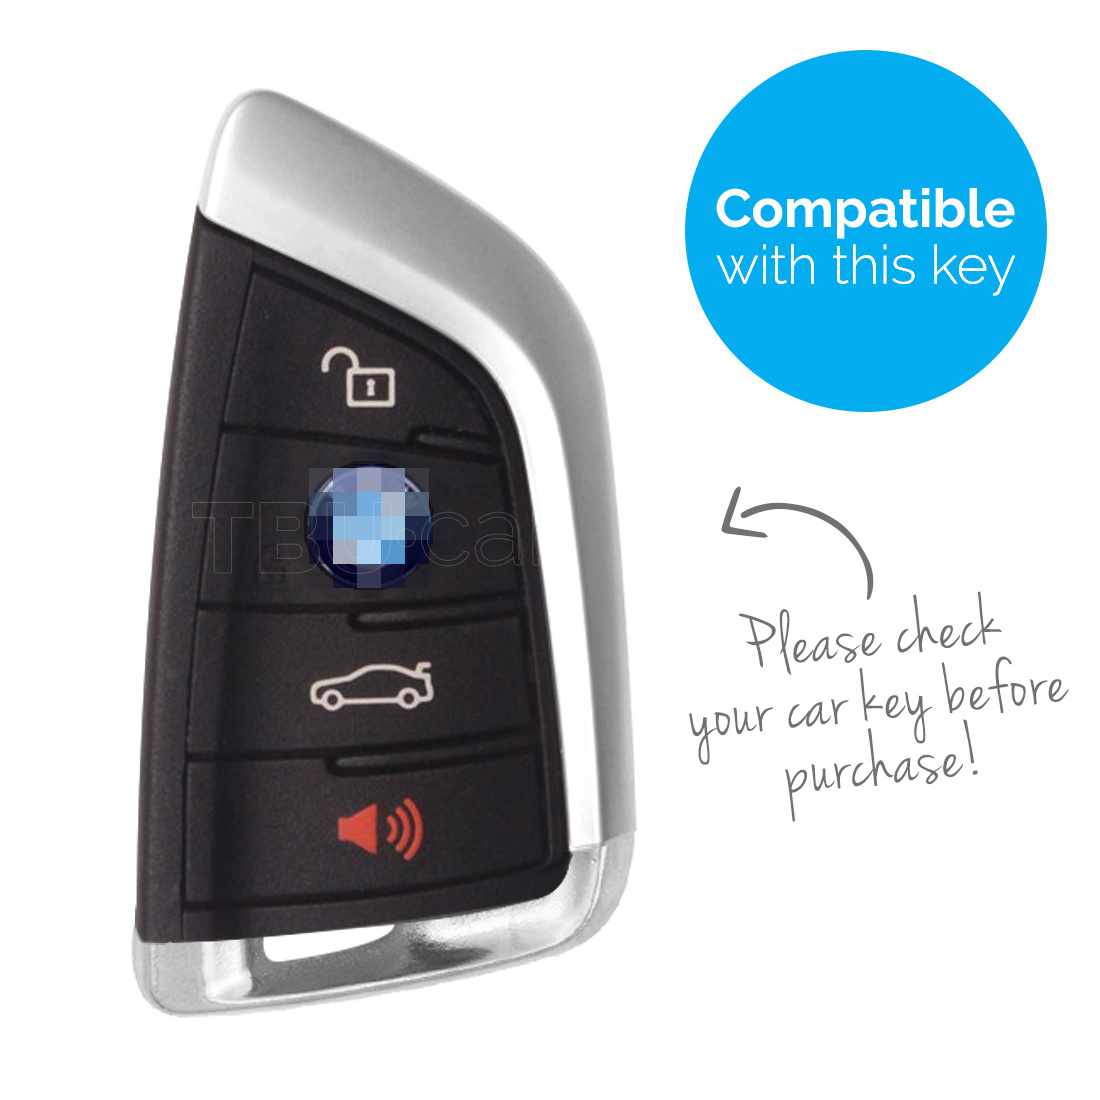 TBU car TBU car Autoschlüssel Hülle kompatibel mit BMW 4 Tasten (Keyless Entry) - Schutzhülle aus Silikon - Auto Schlüsselhülle Cover in Schwarz